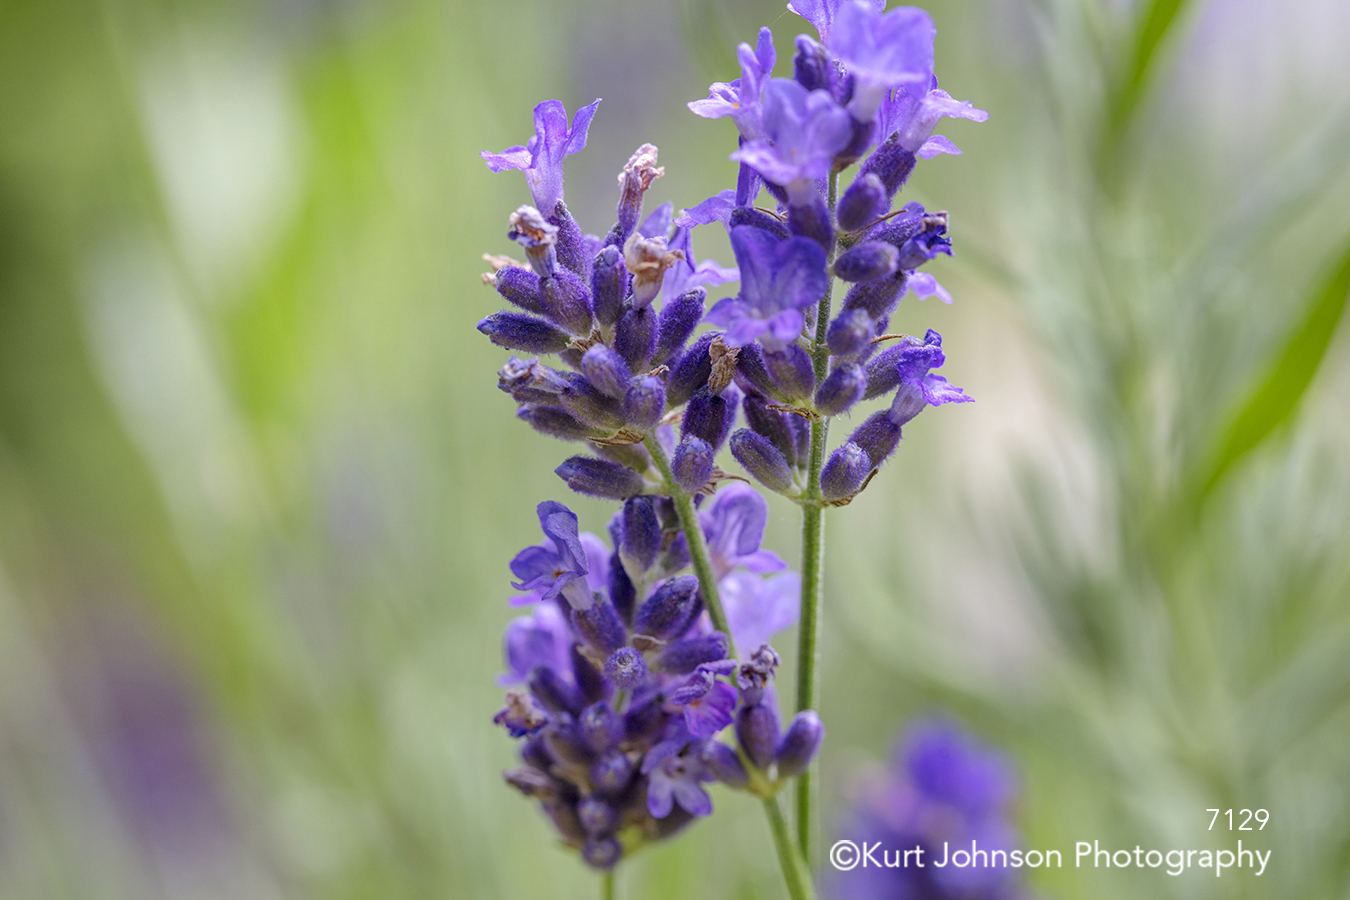 purple violet lavender flower buds close up macro detail stem flowers grasses